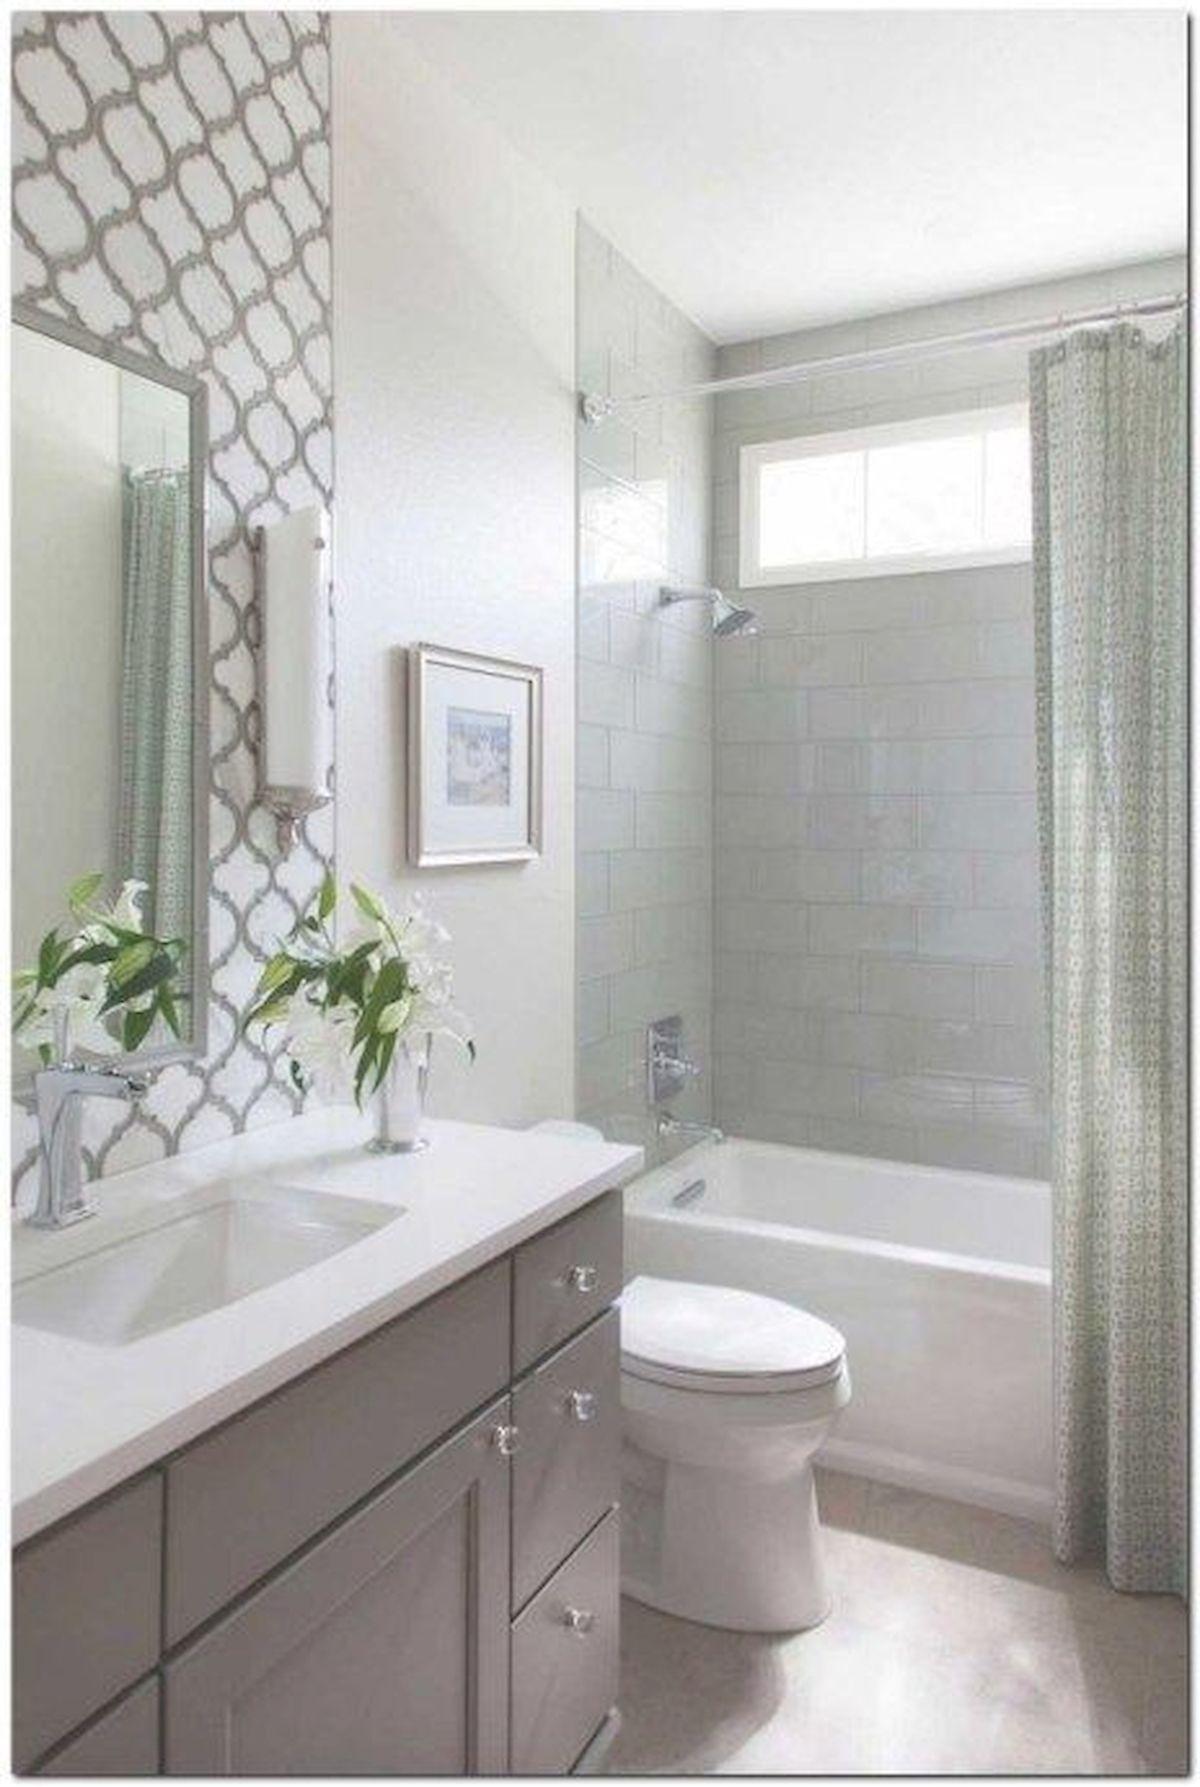 6 Elegant Bathroom Ideas For Compact Spaces: 60 Elegant Small Master Bathroom Remodel Ideas